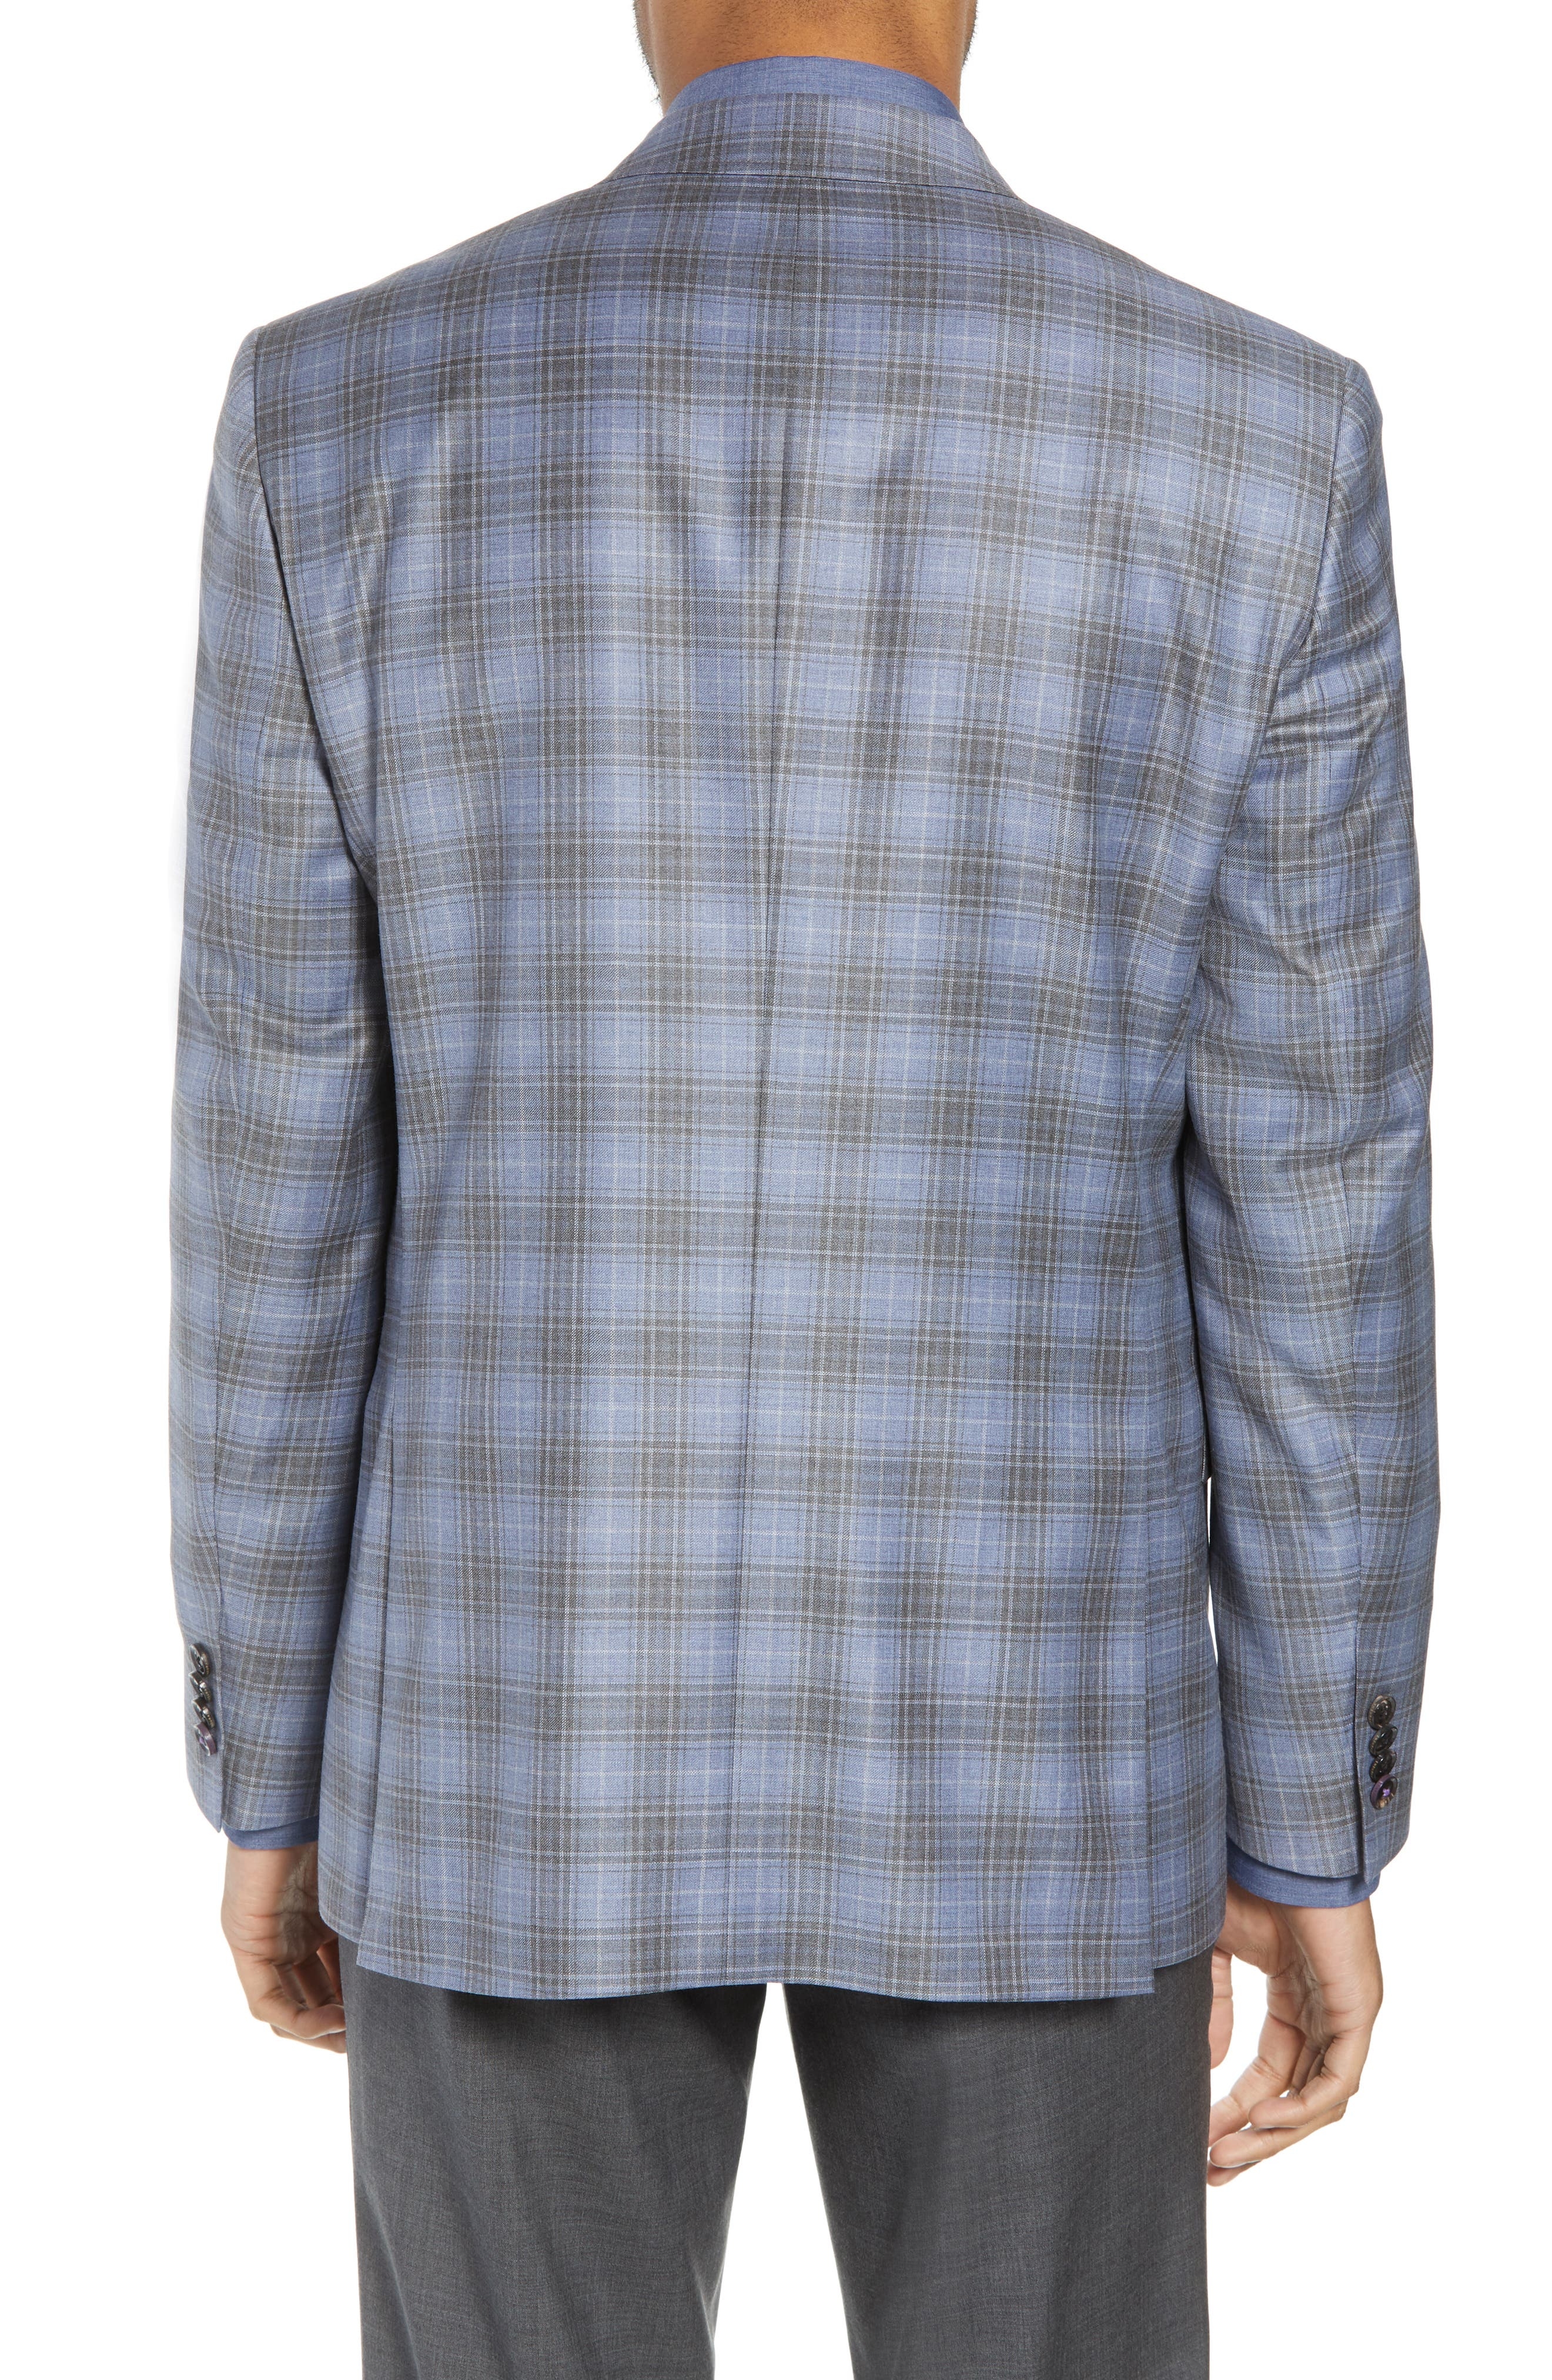 Jay Trim Fit Plaid Wool Sport Coat,                             Alternate thumbnail 2, color,                             Light Blue